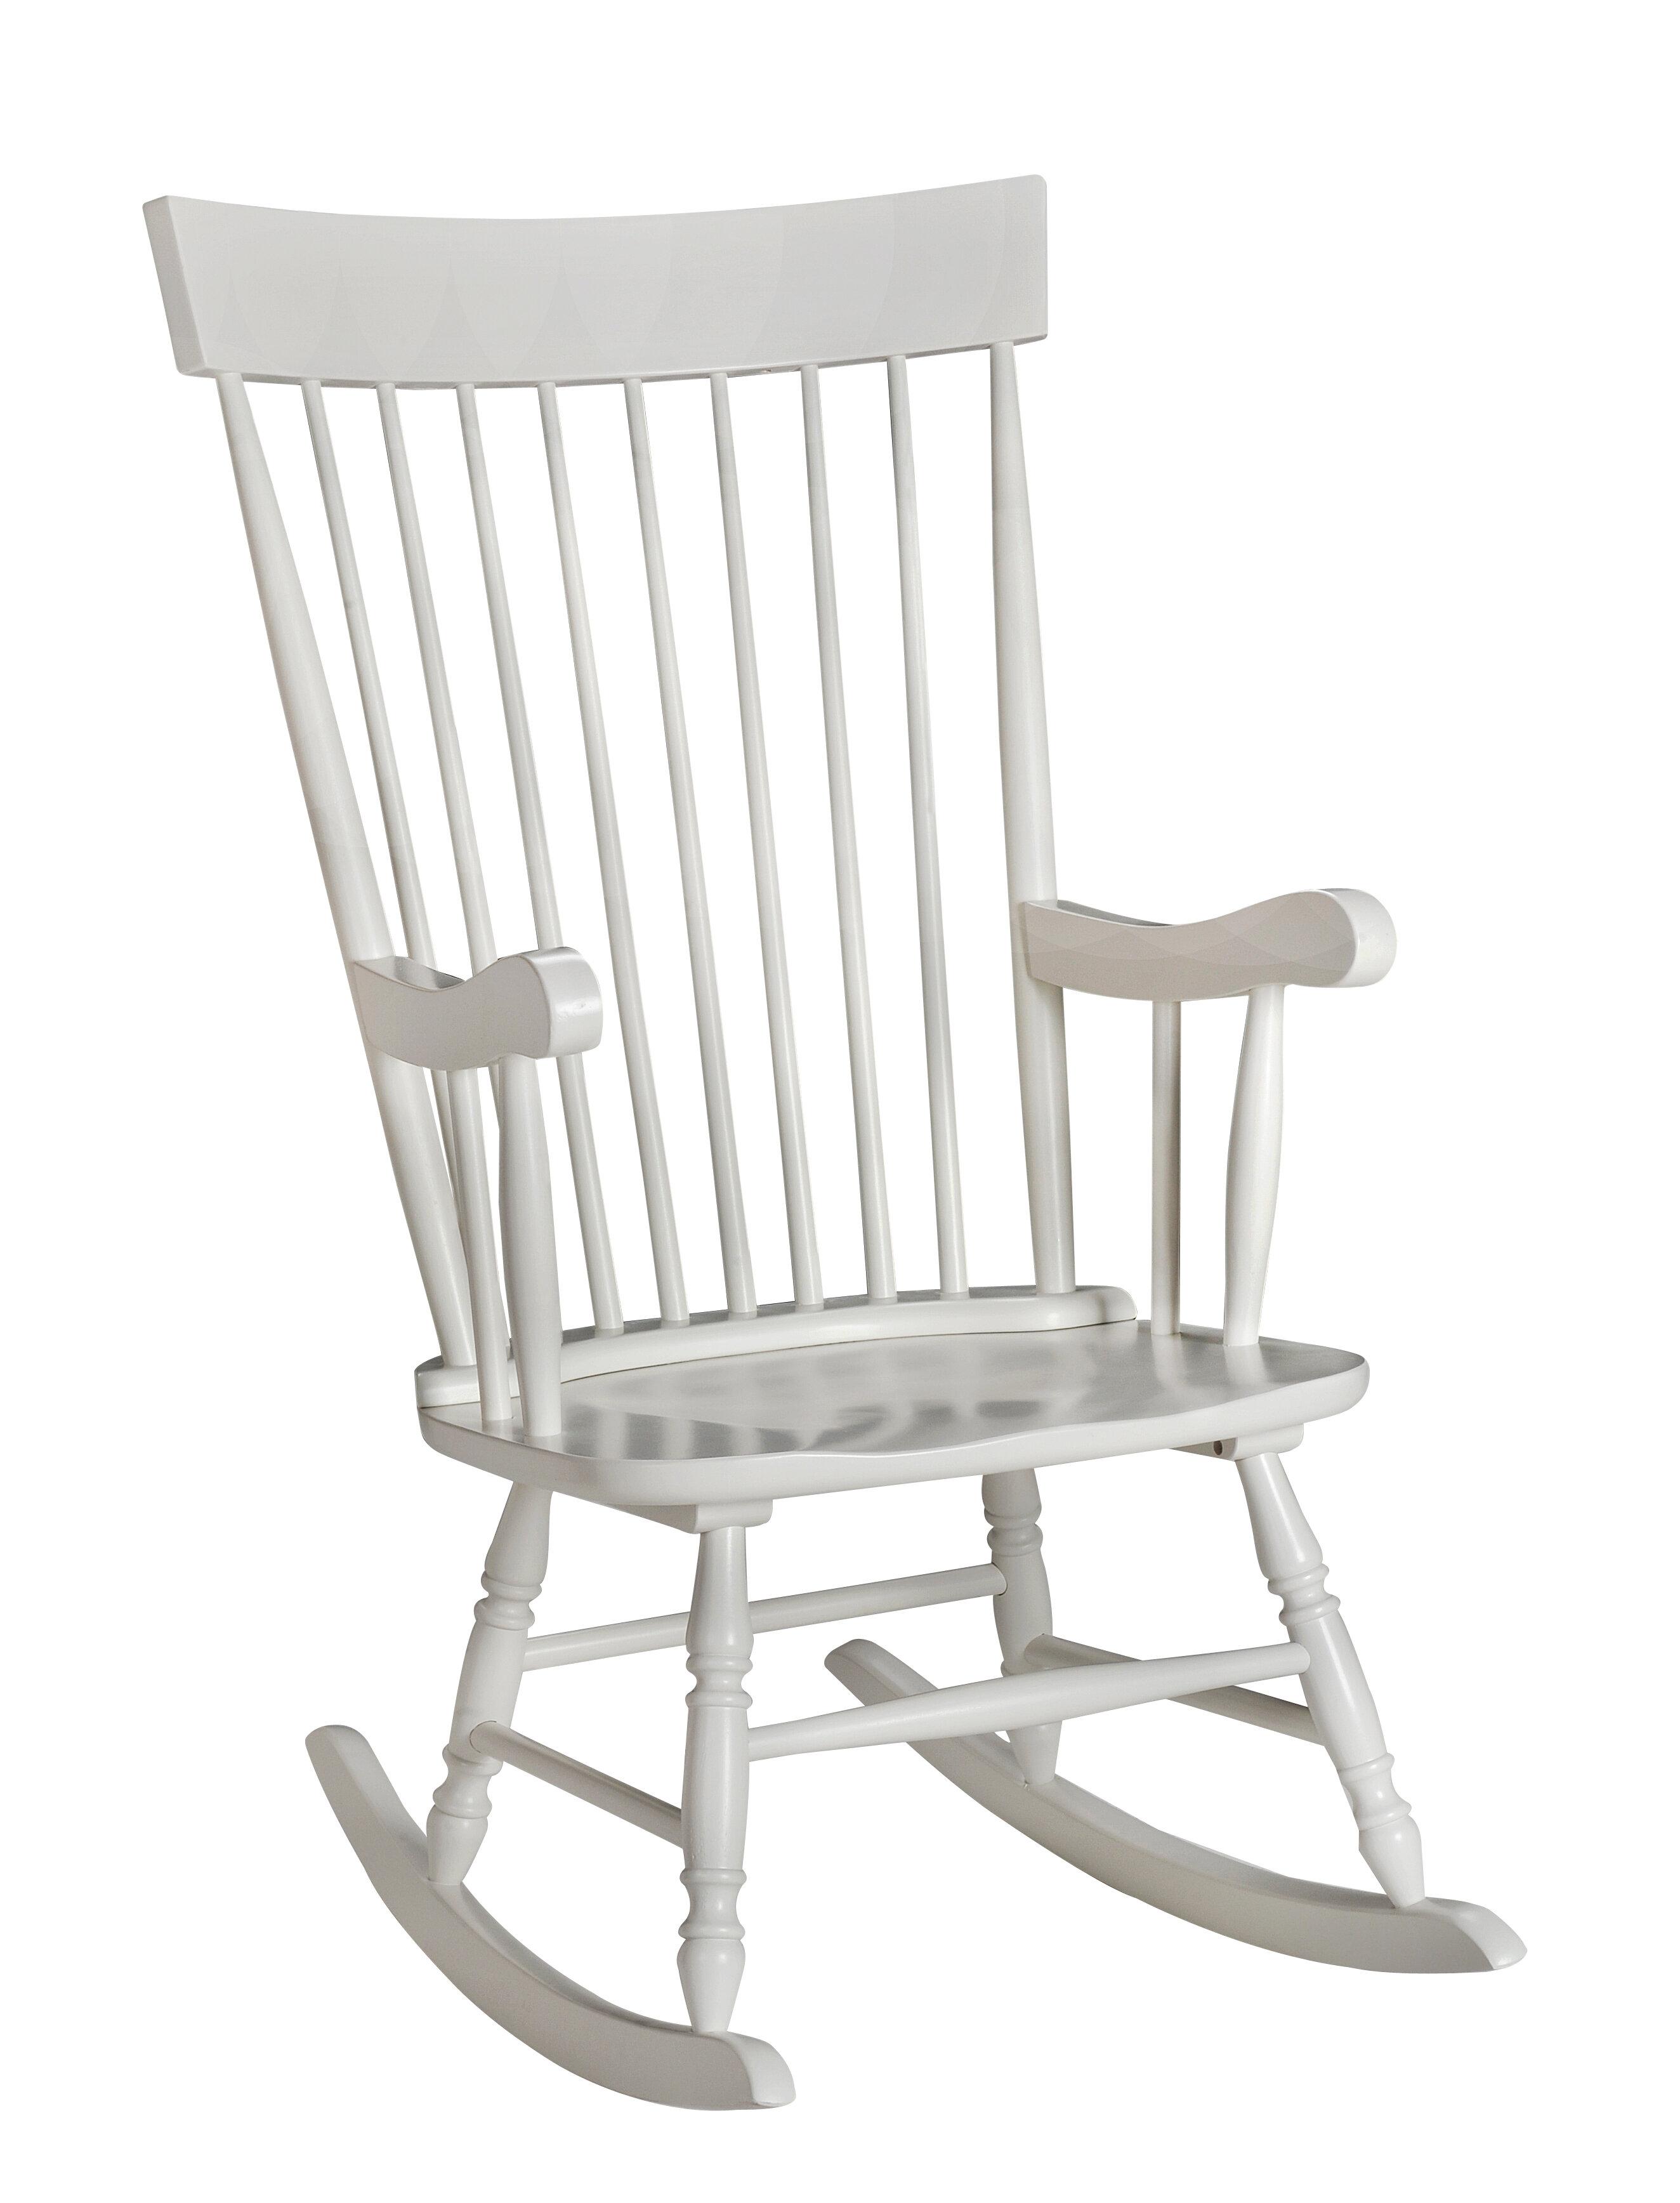 Darby Home Co Danvers Rocking Chair Reviews Wayfair